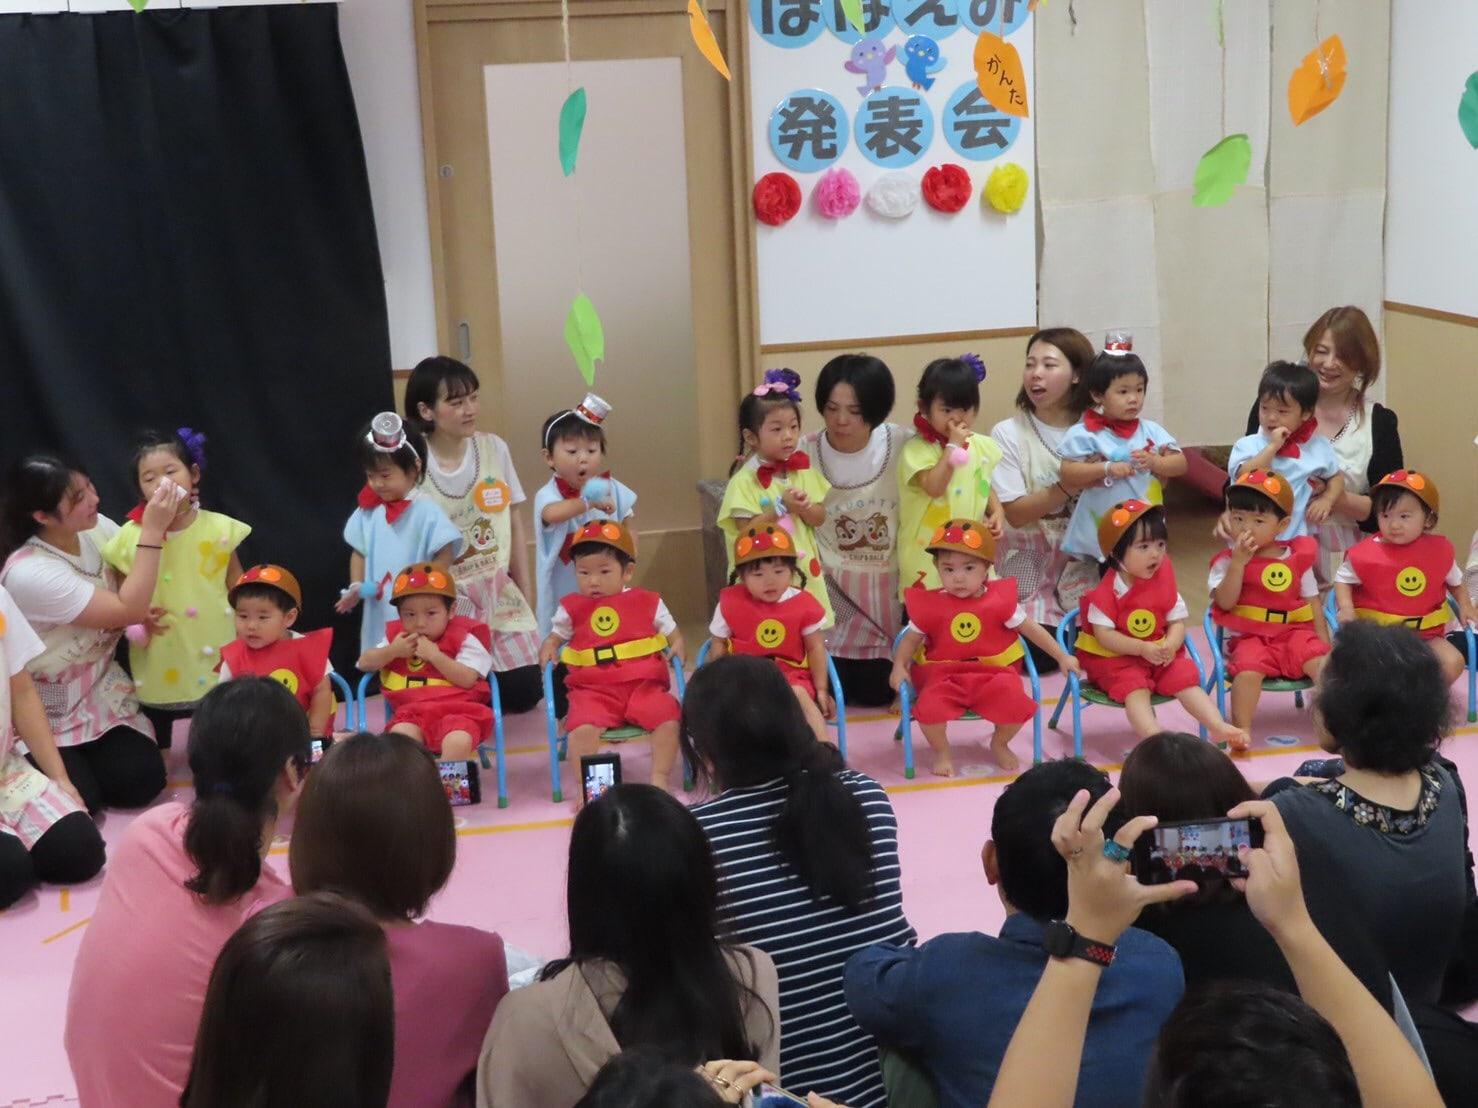 保育参観発表会👯♂🎉長岡京園 キャッチ画像